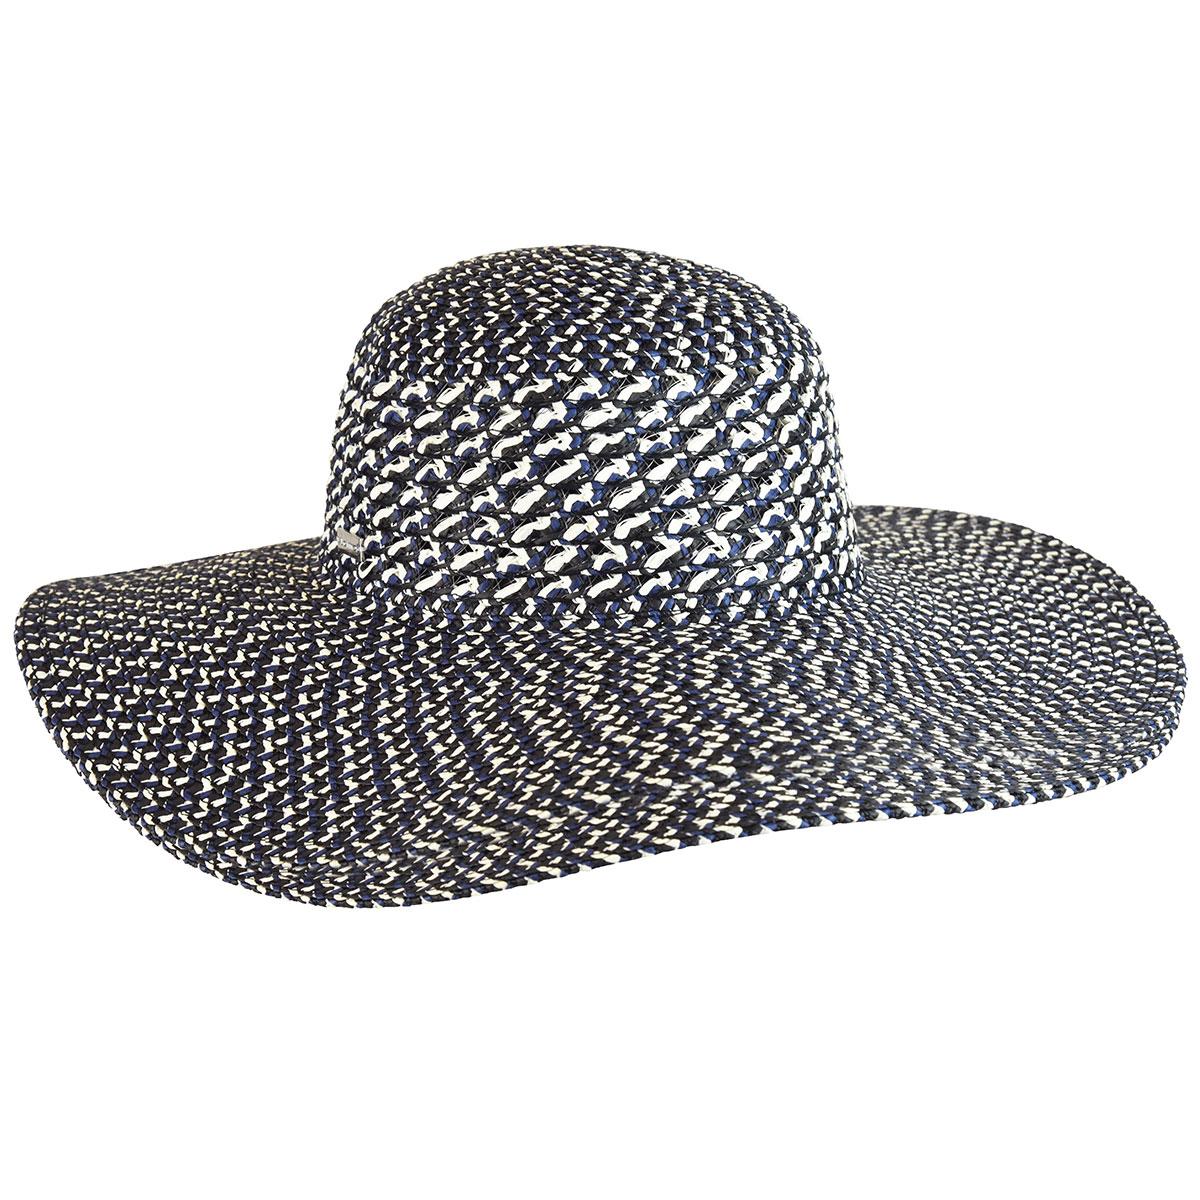 Alice Wide Brim Hat - Black Multi/1SFM